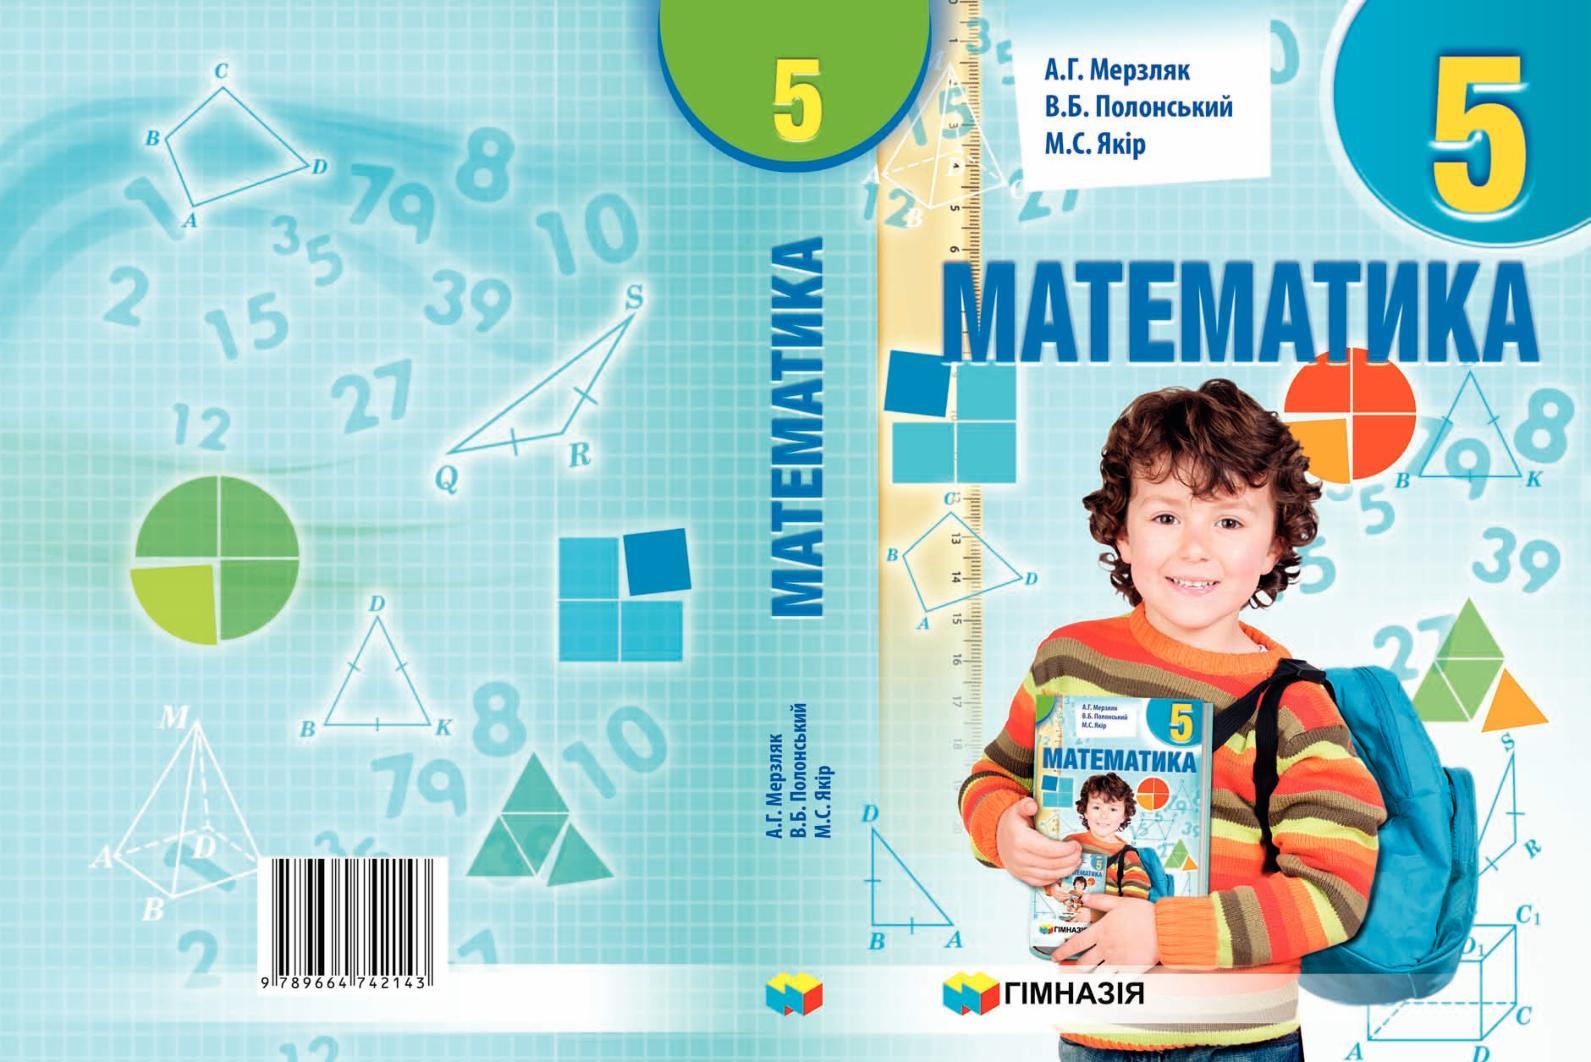 Calaméo - Математика 54dc183499fc2